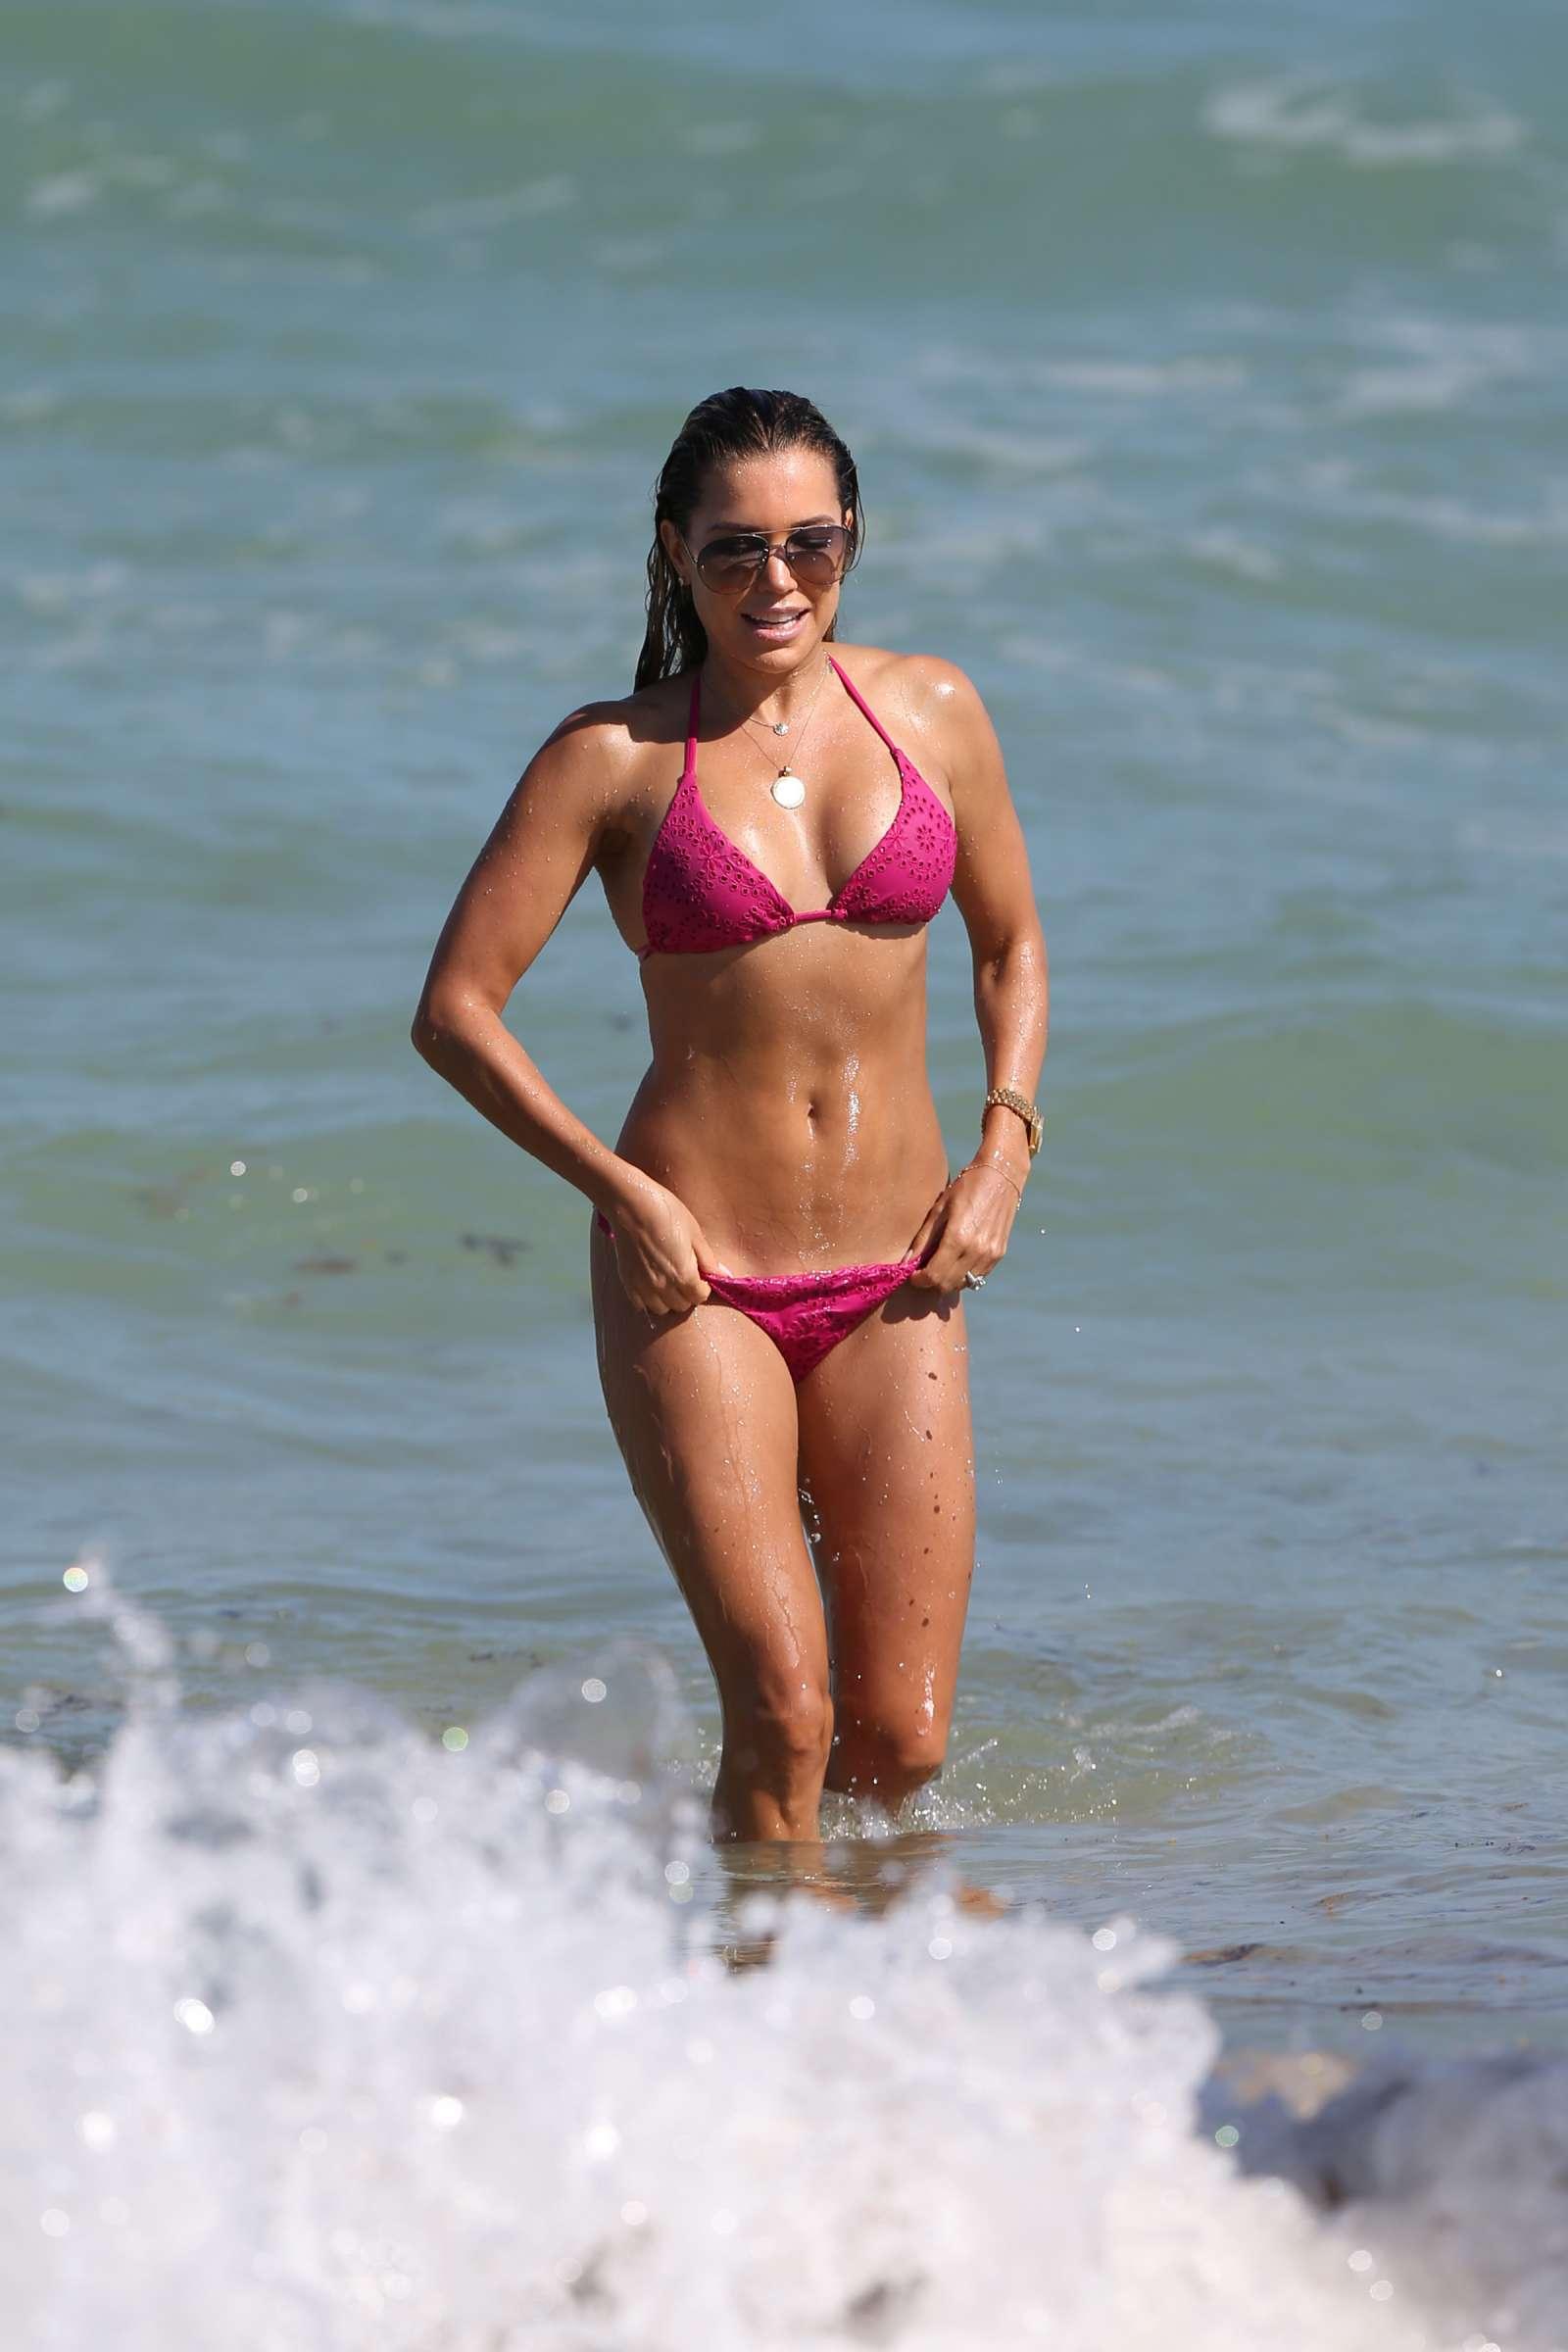 Sylvie Meis 2018 : Sylvie Meis in Pink Bikini 2018 -11